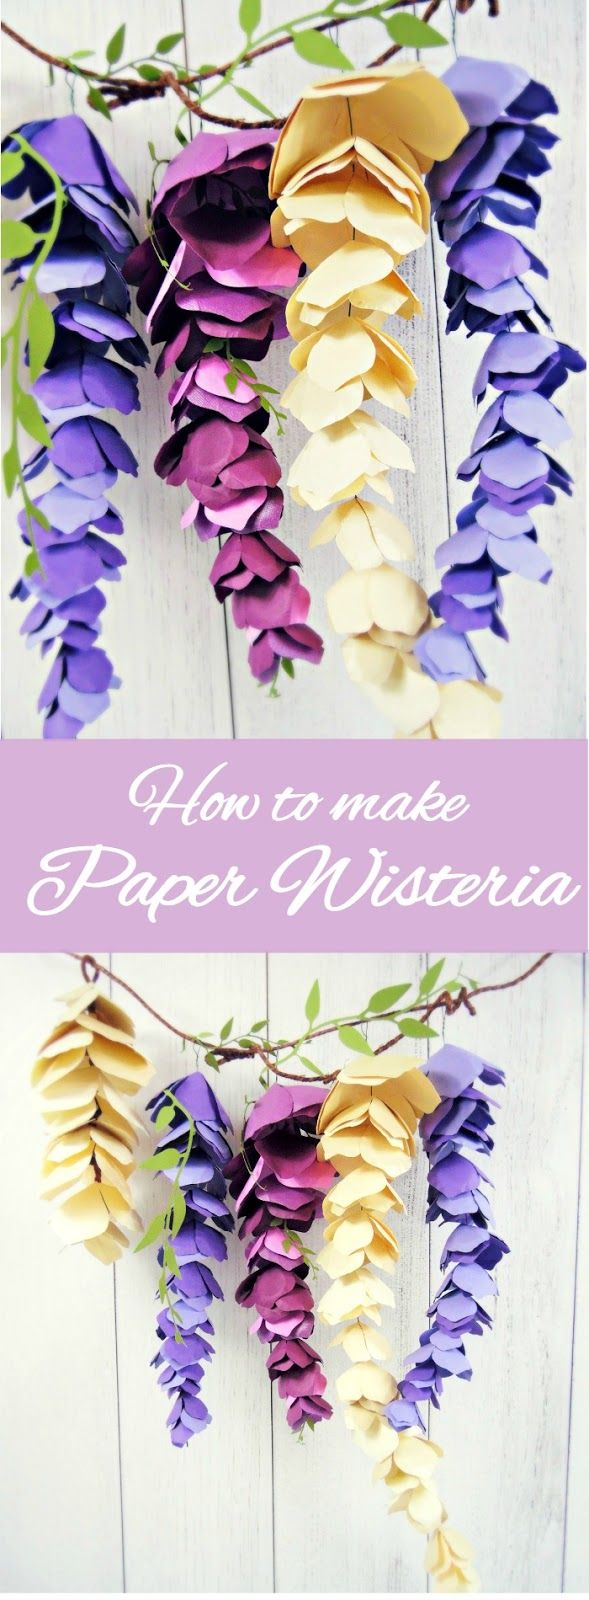 Hanging paper wisteria tutorial templates diy paper paper how to make hanging paper wisteria diy paper flowers wisteria templates dhlflorist Images